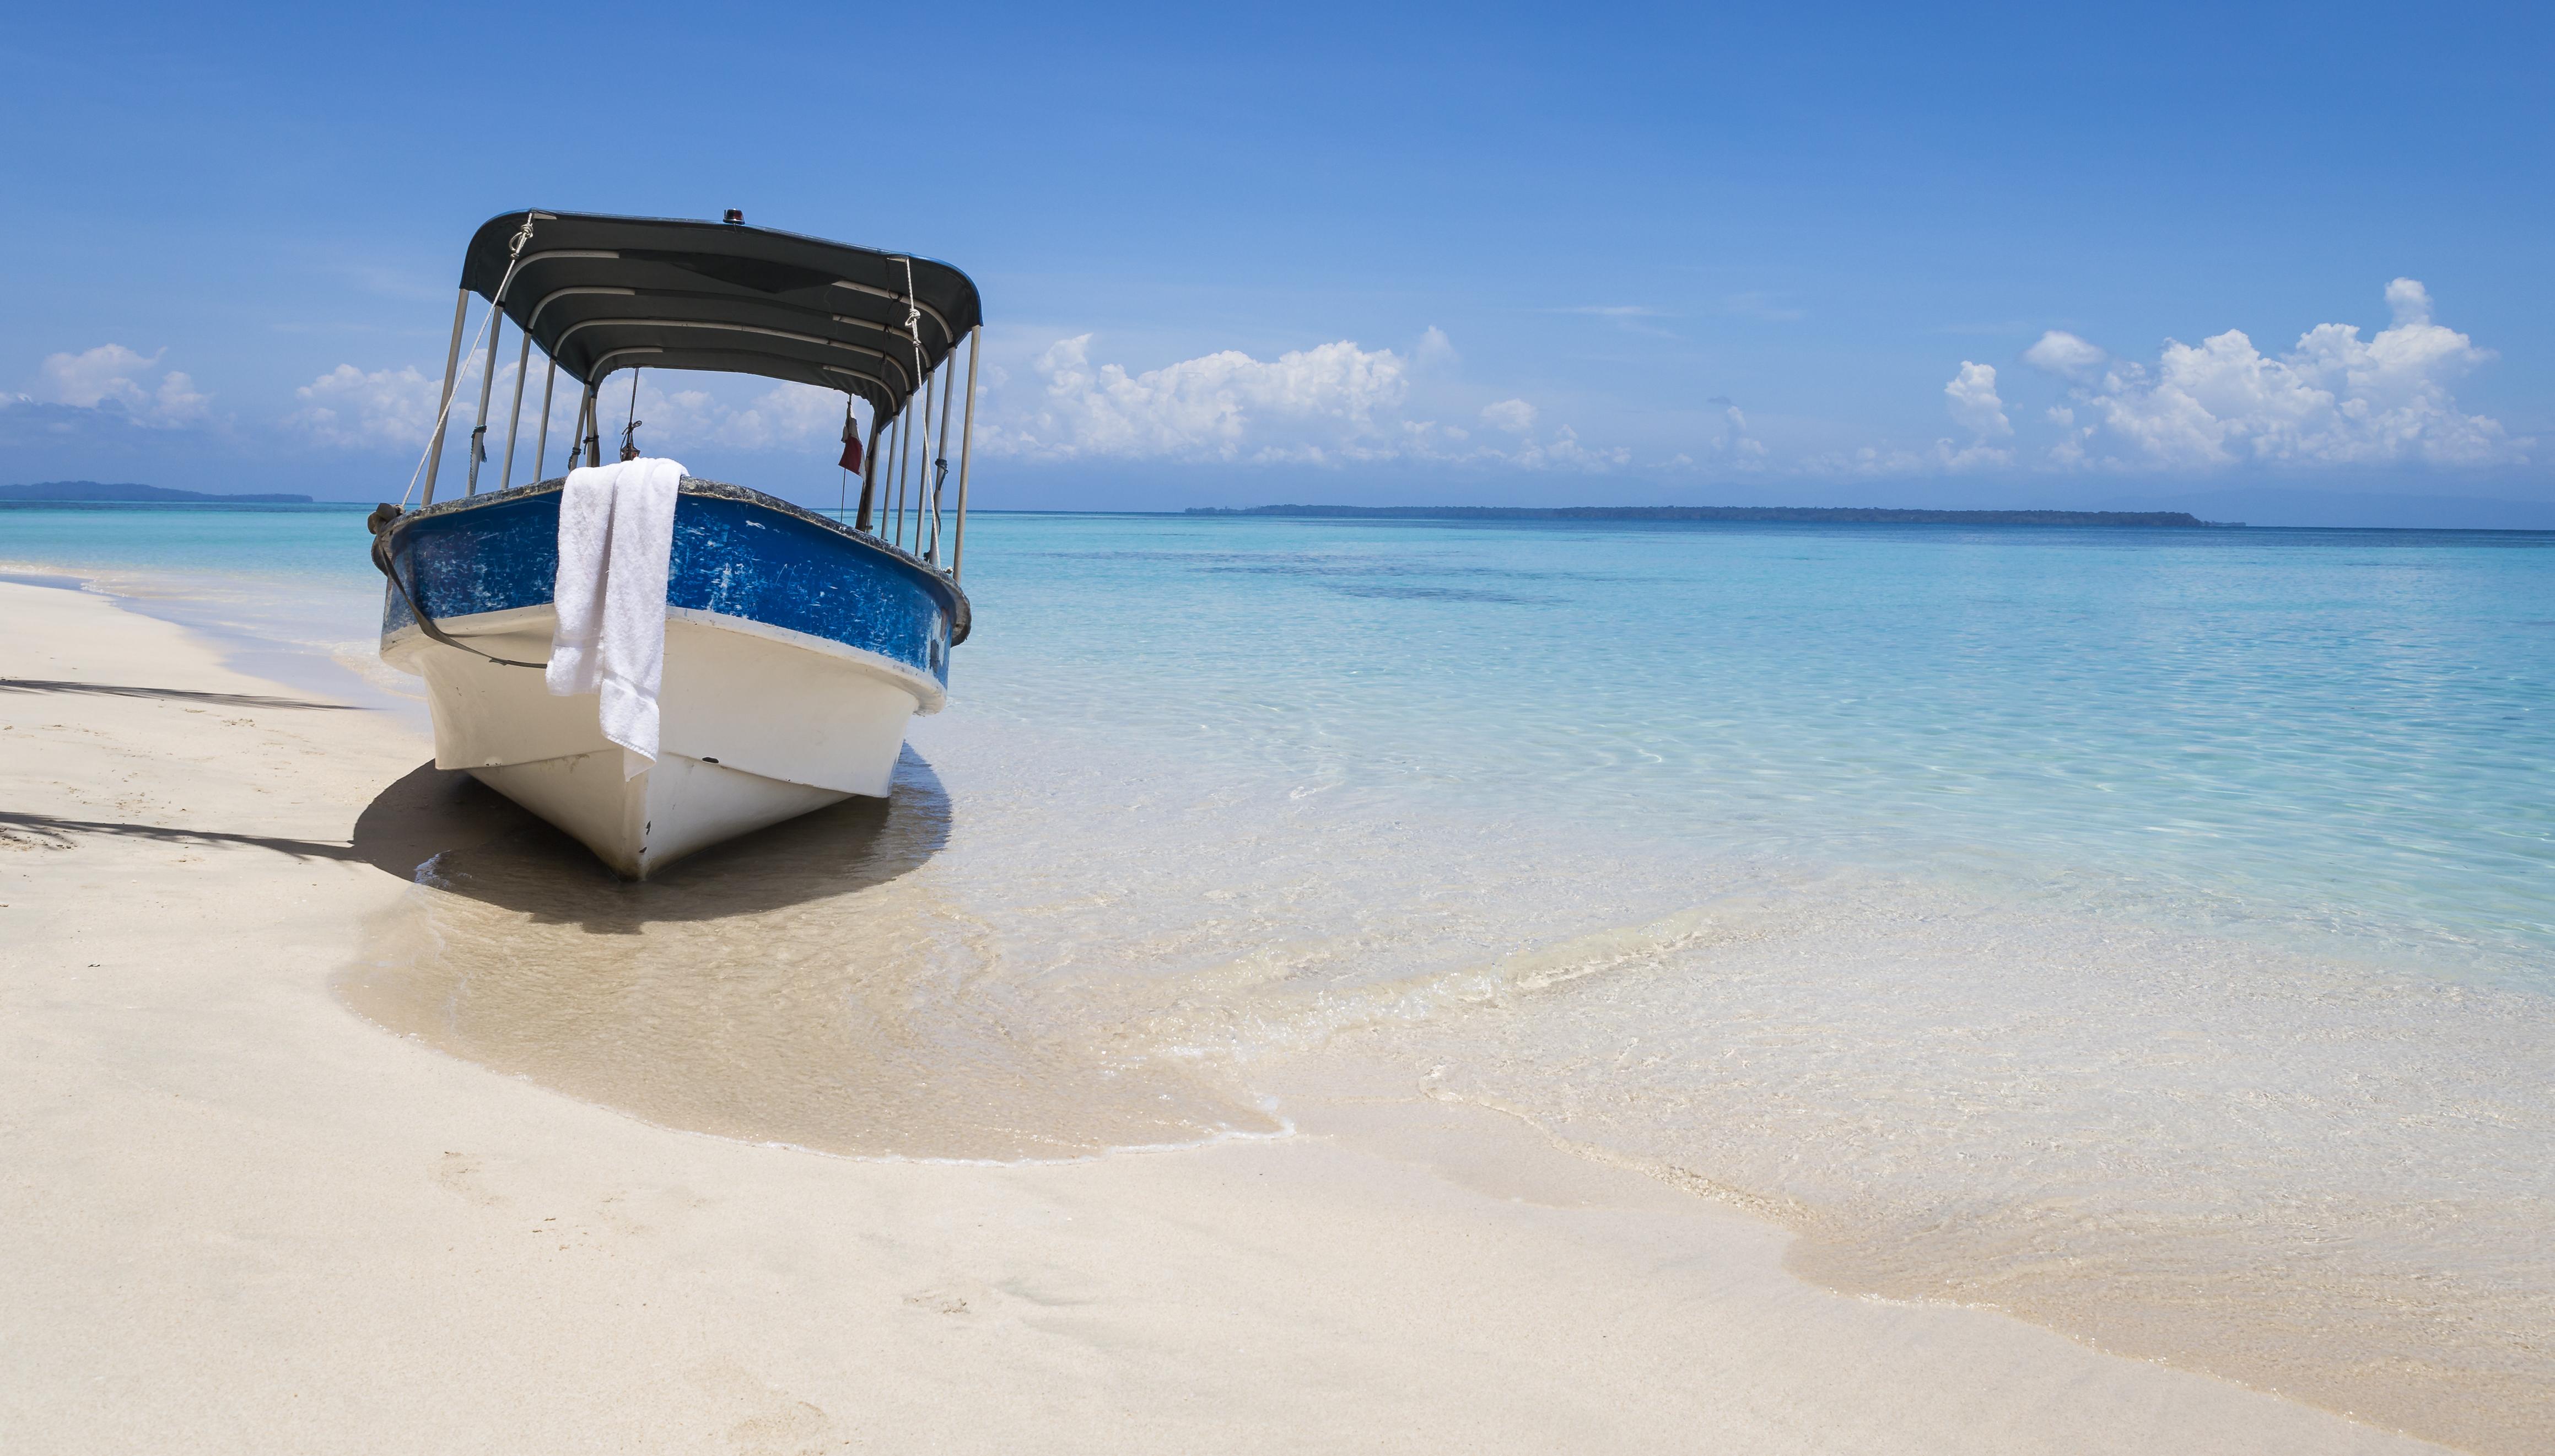 Boat on beach in Cayo Zapatilla, Bocas del Toro, Paanama